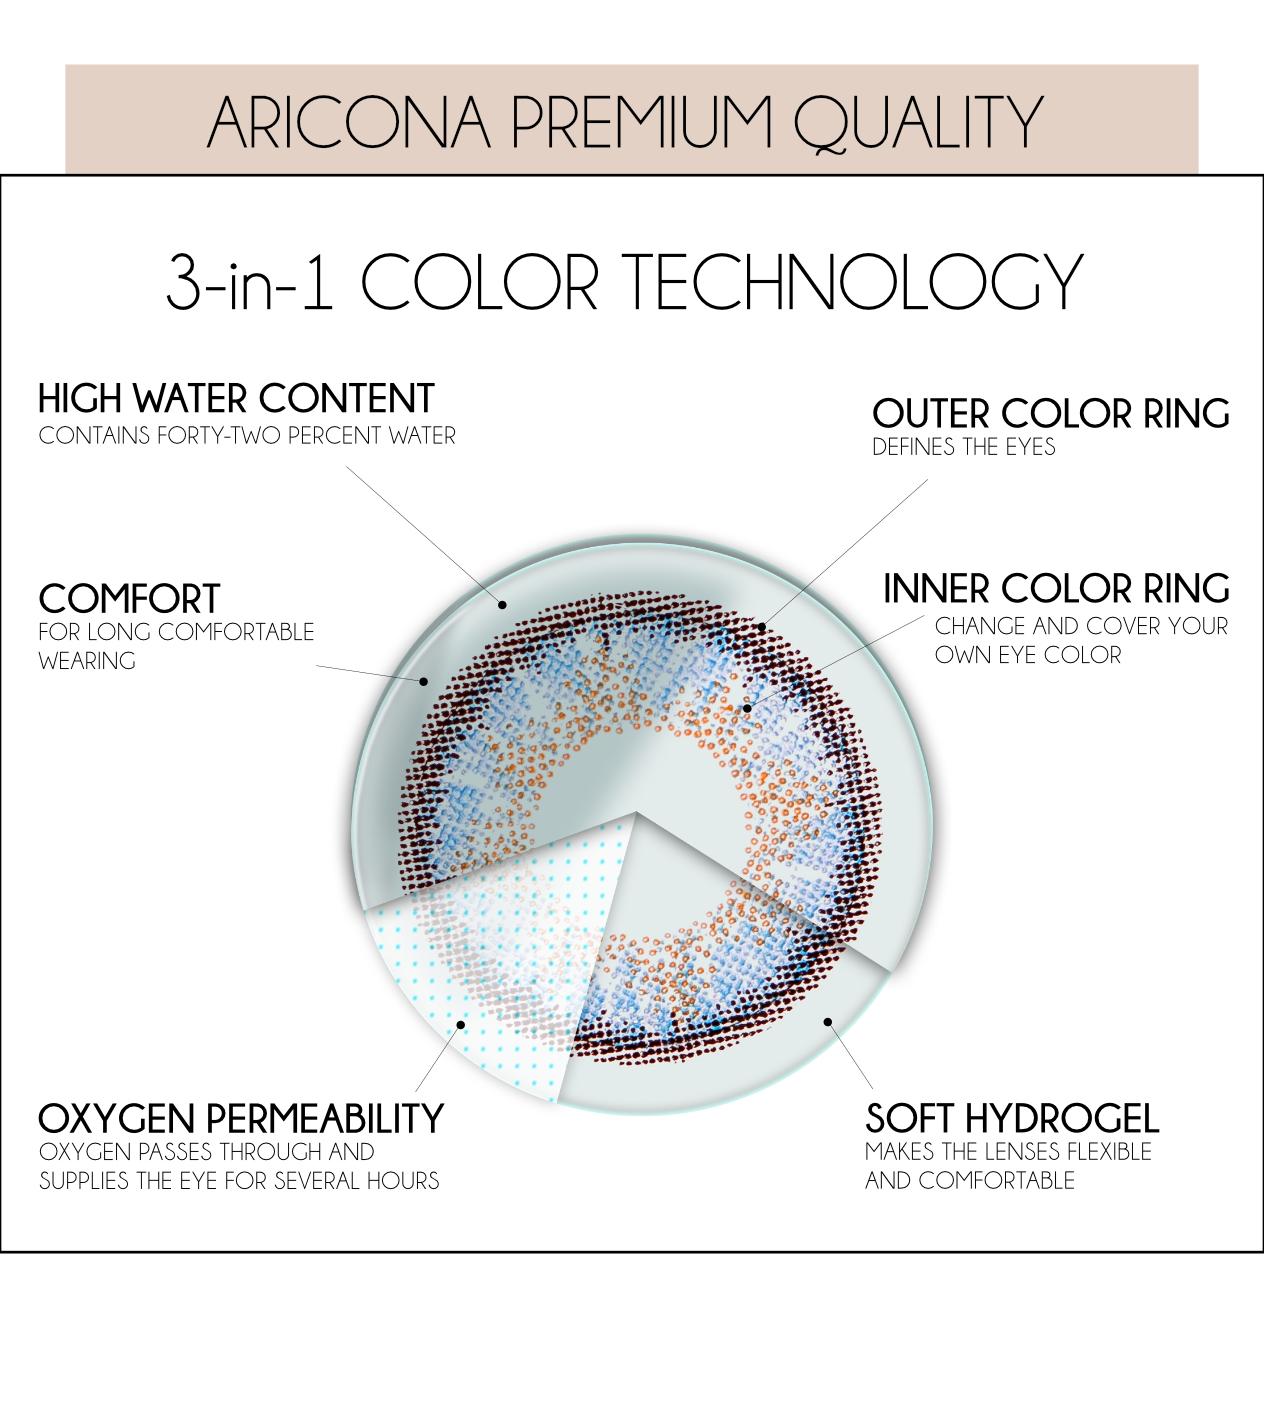 aricona quality